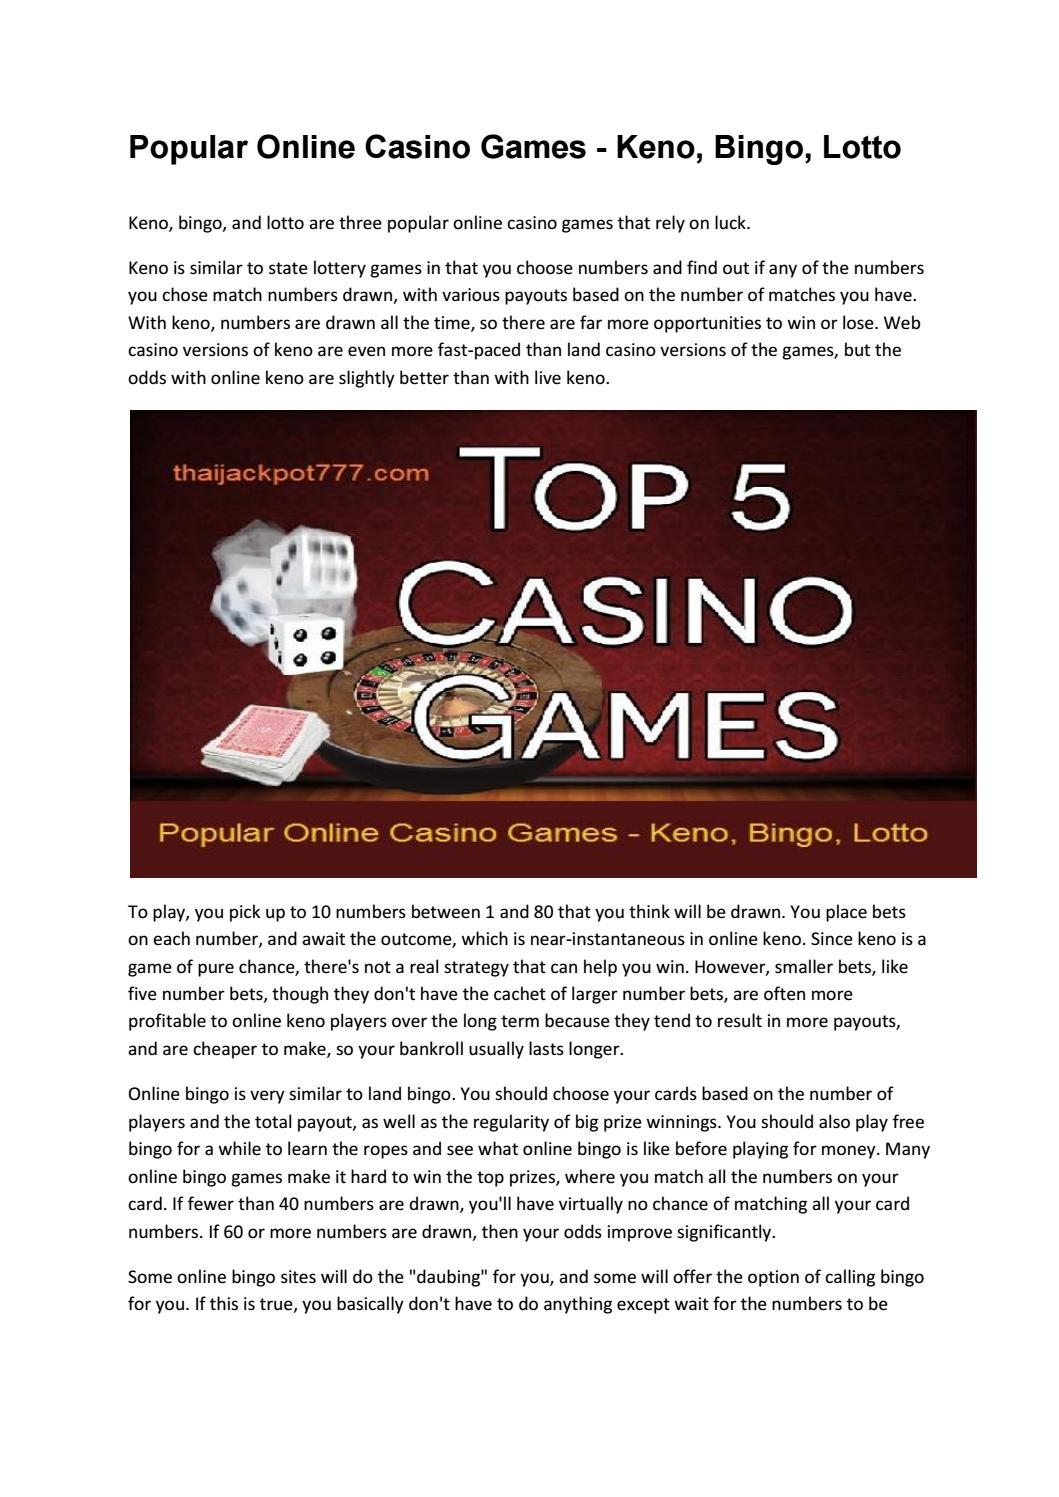 Popular Online Casino Games Keno Bingo Lotto By Thai Jackpot777 Issuu